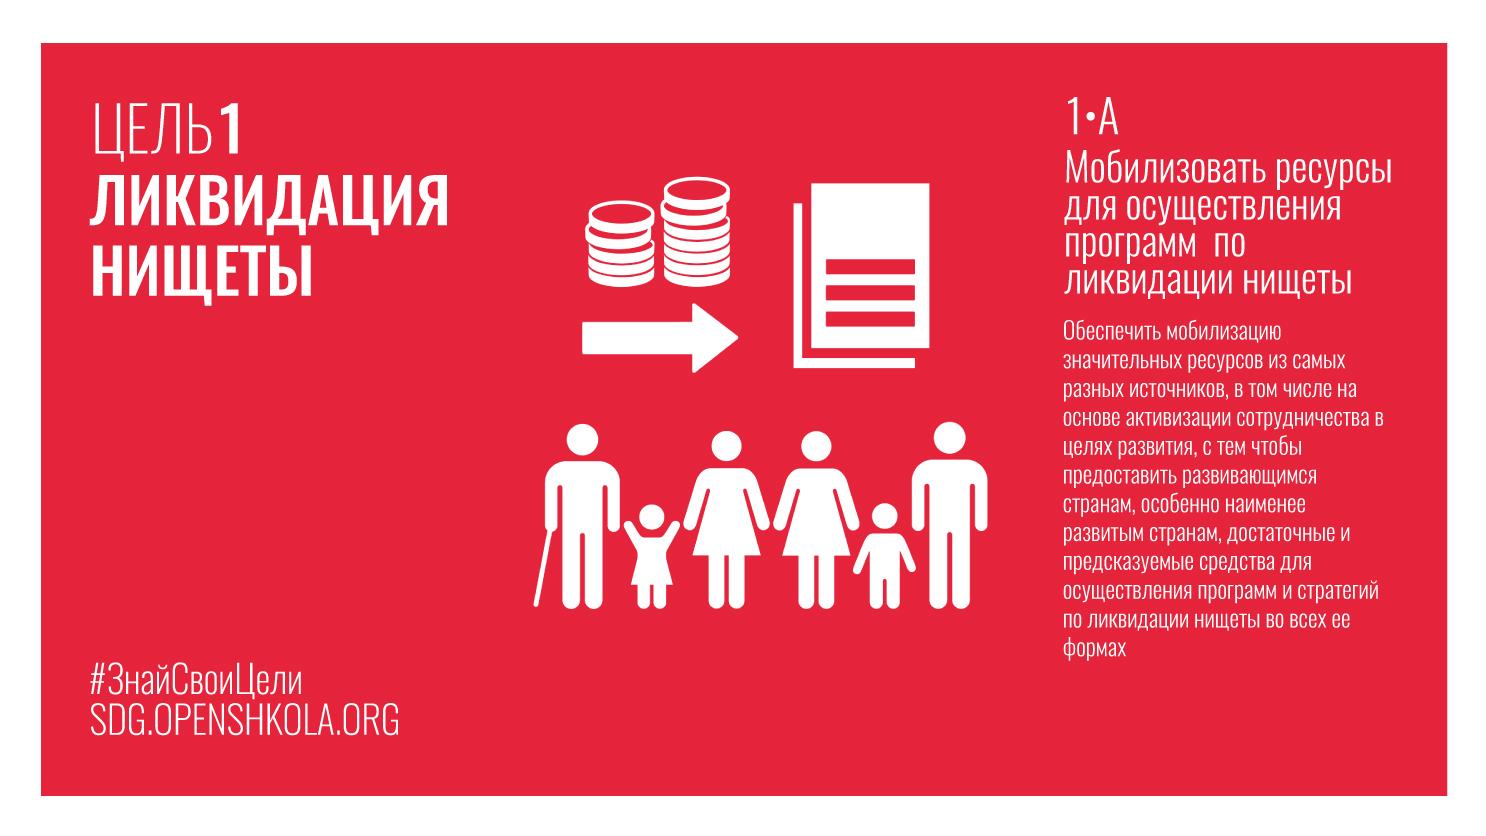 Картинки по запросу ЦУР1 Бедностьи нищета